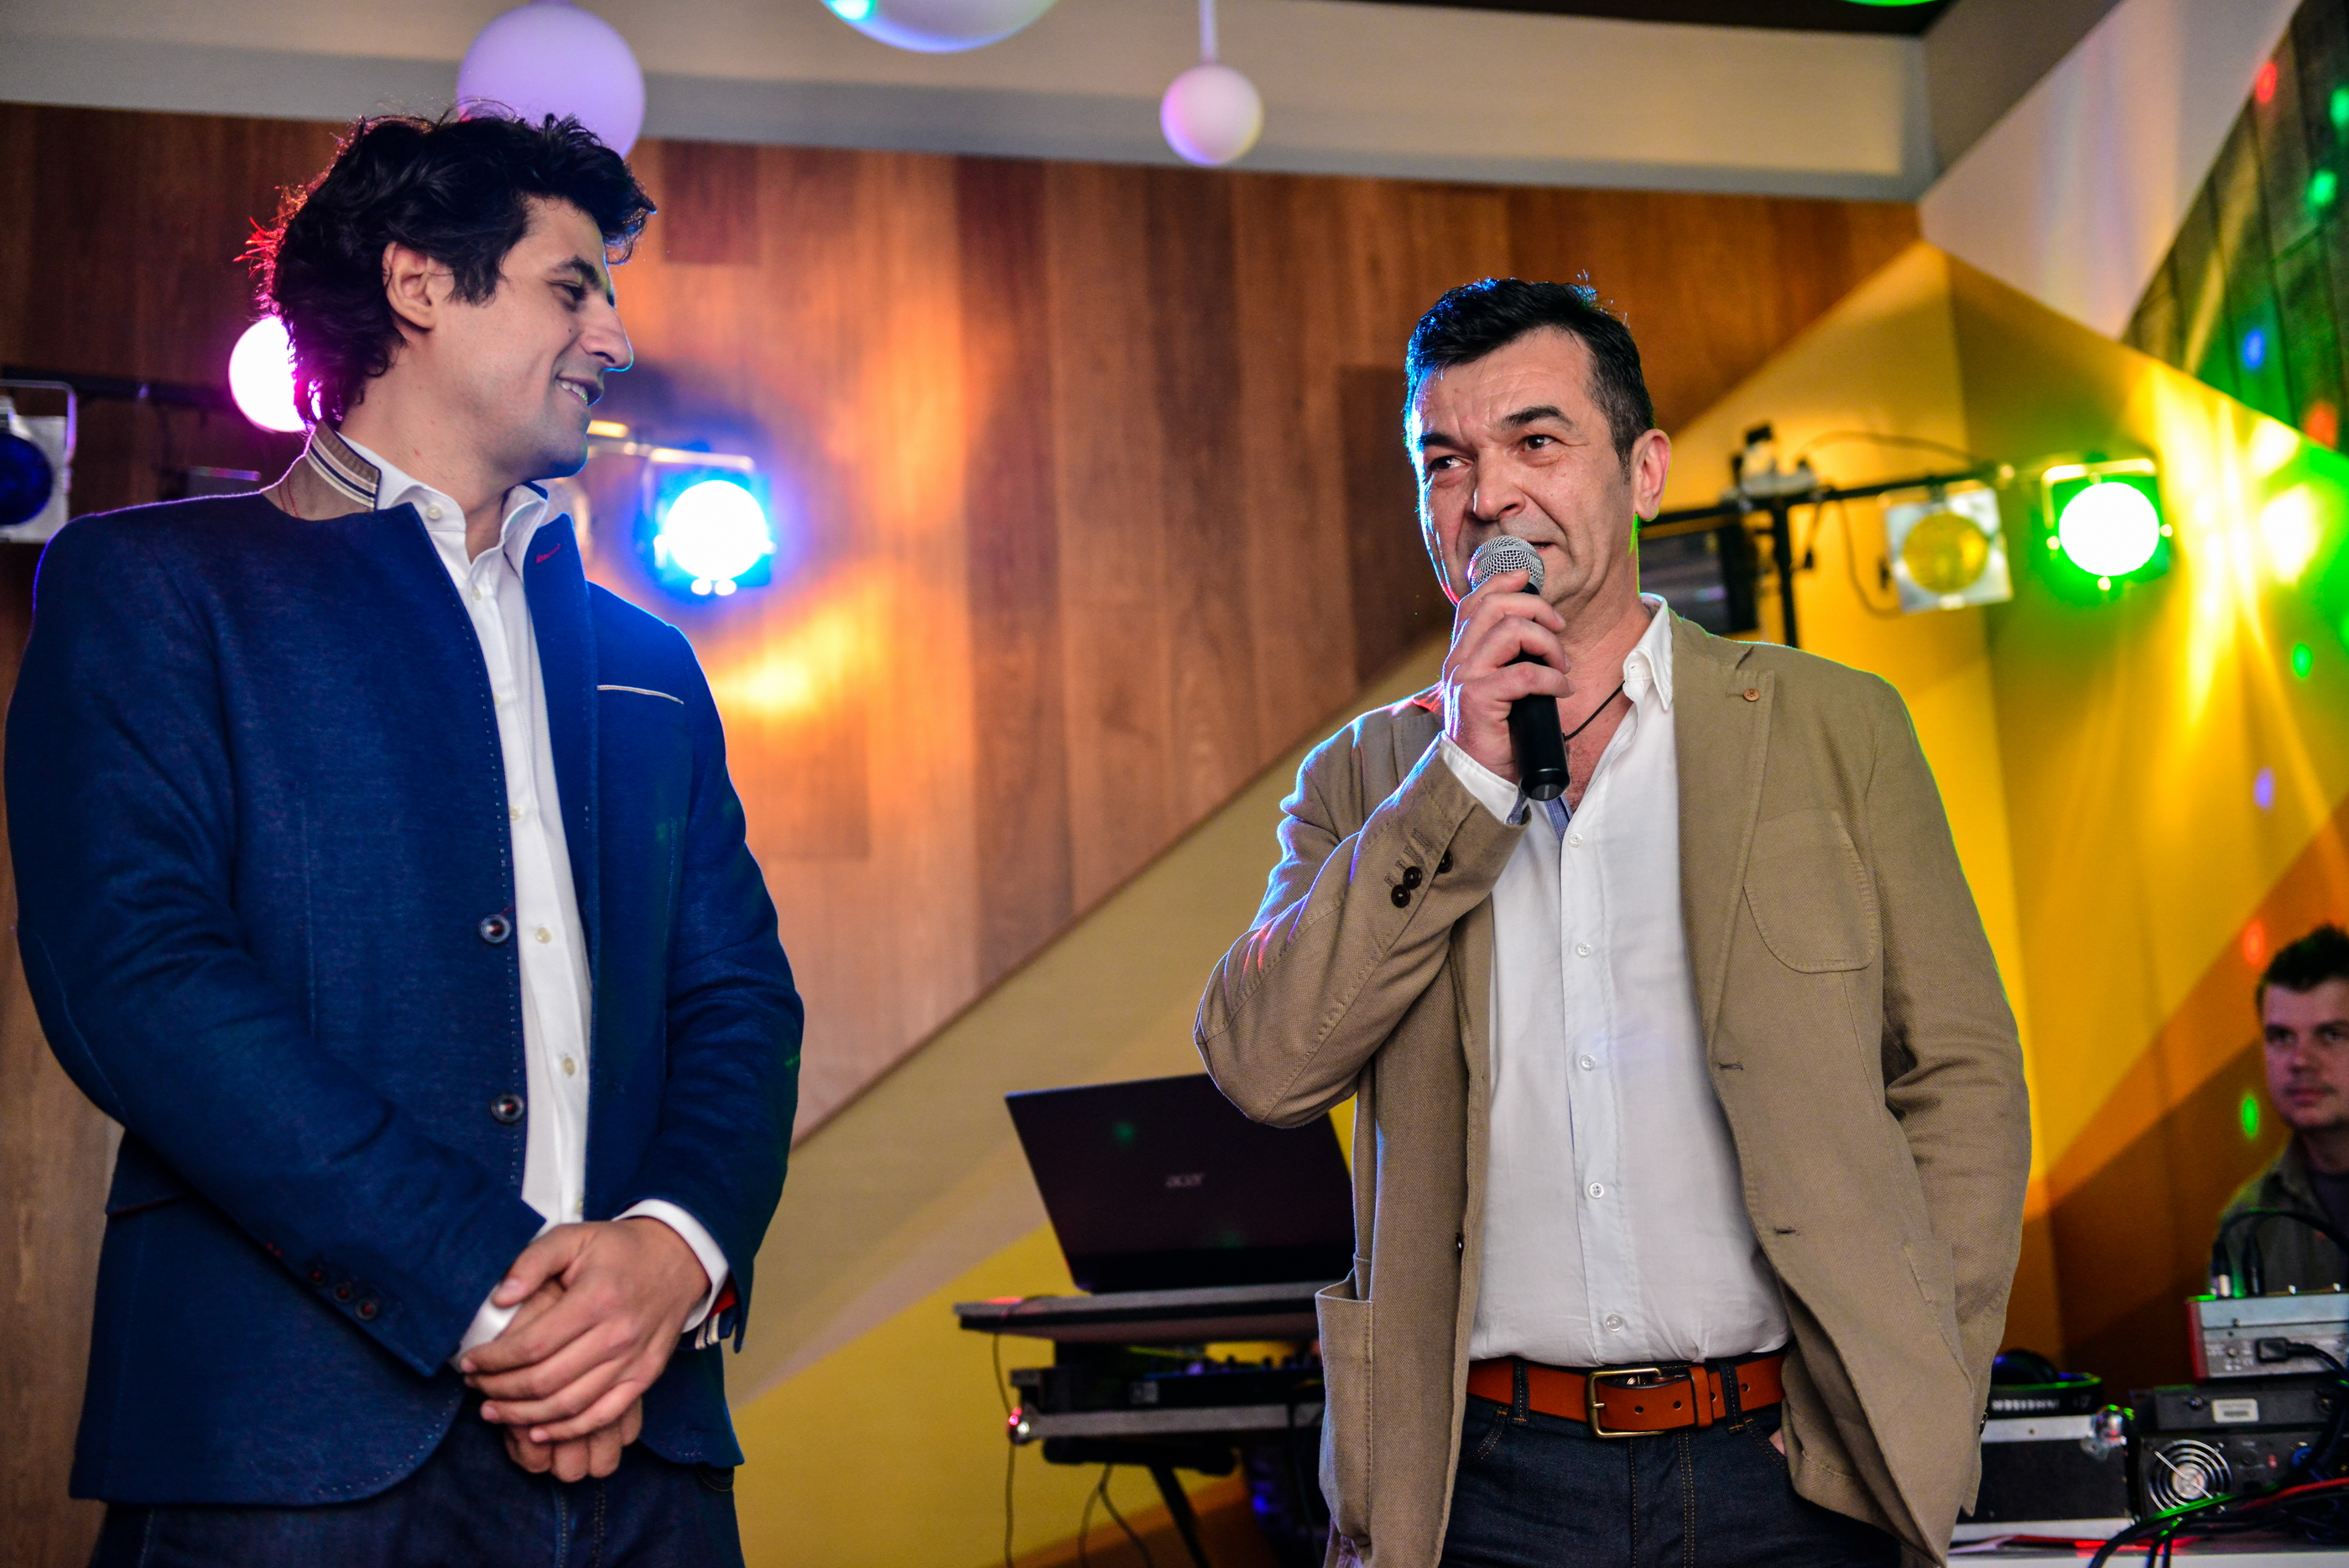 Marius Lembac BAULAND - Daniel Georgescu - S-a deschis Showroom-ul ETAGE din strada Nerva Traian nr